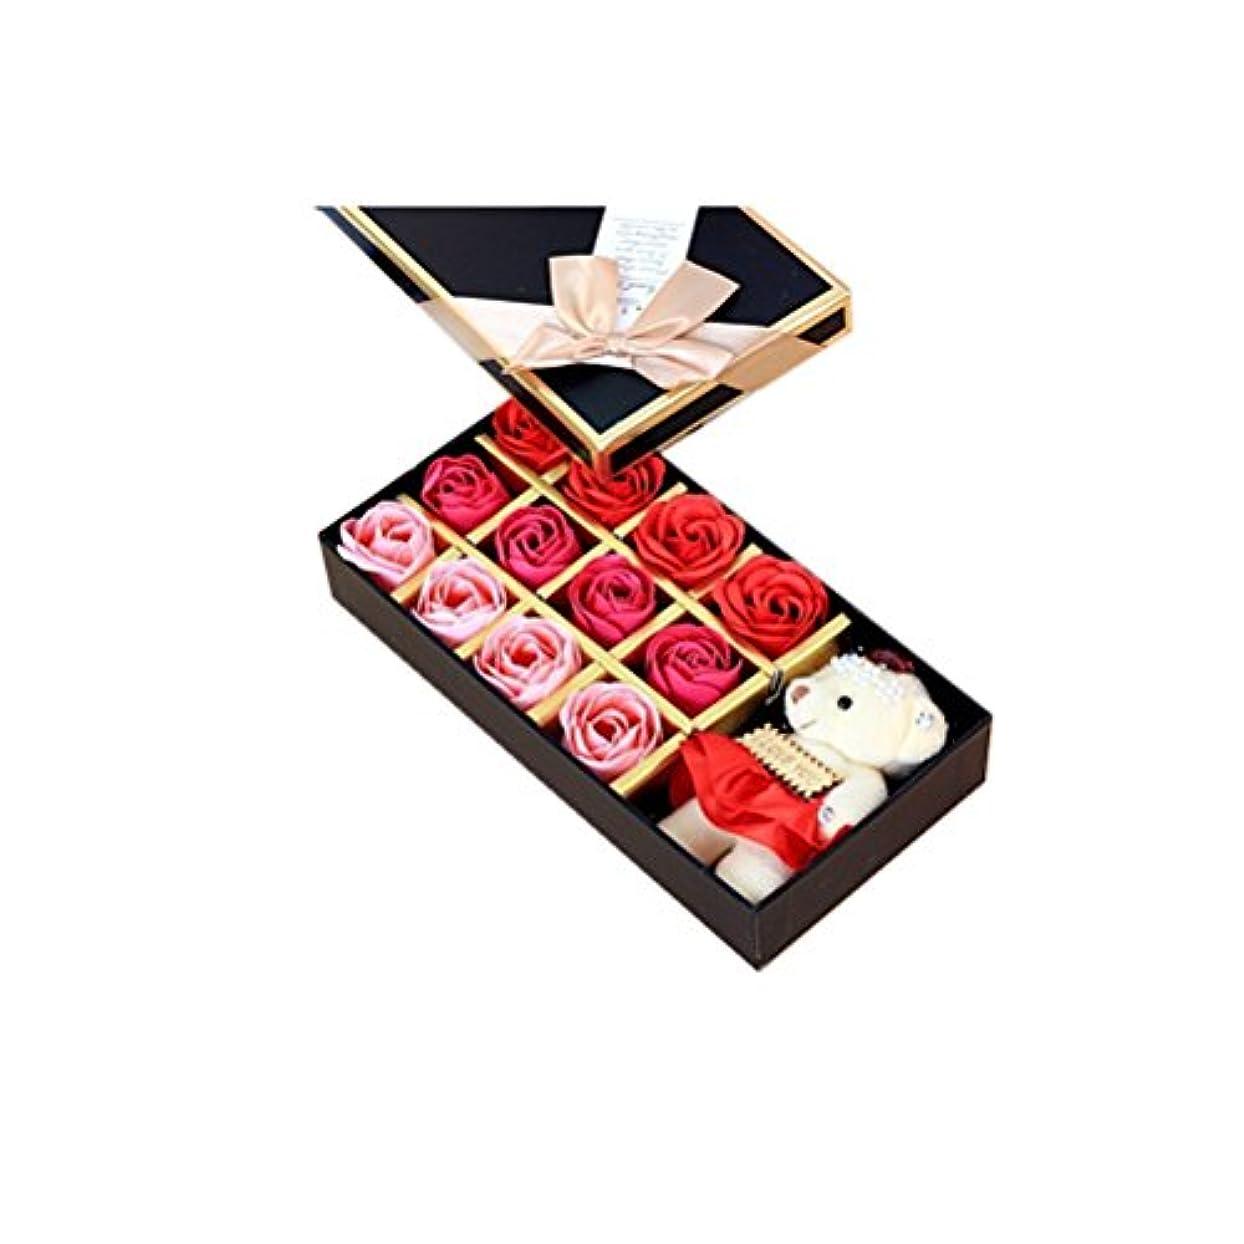 ROSENICE 香り バラの花 お風呂 石鹸 ギフトボックス (赤)